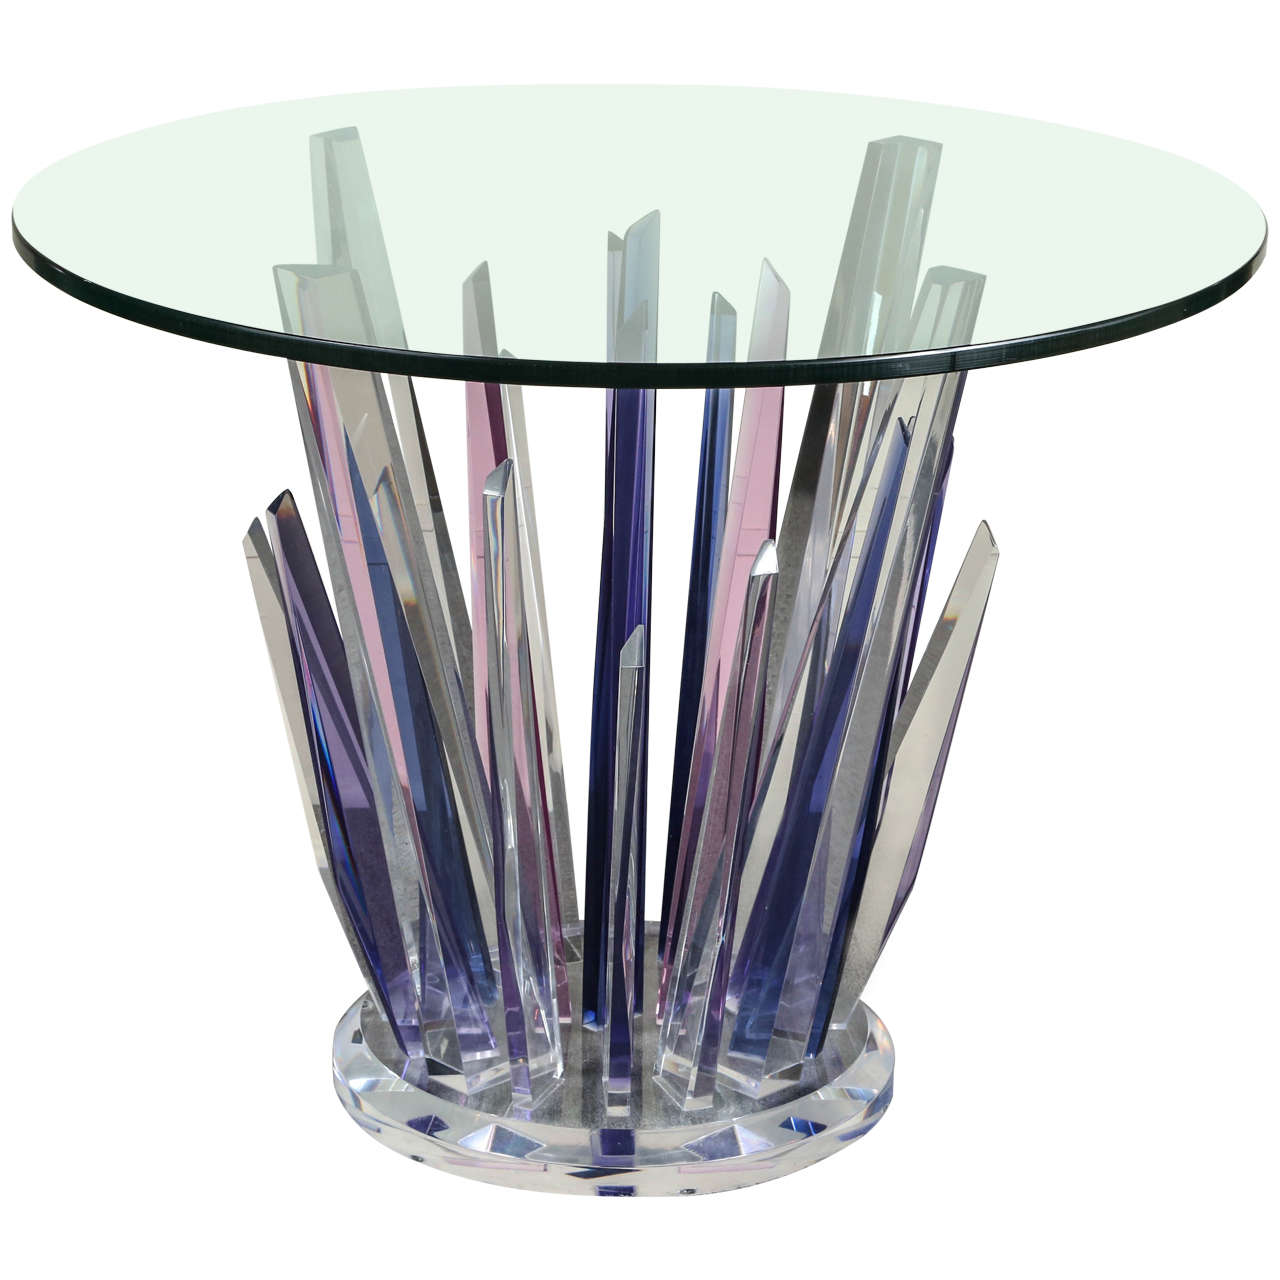 Stunning Stalagmite Lucite Table 1